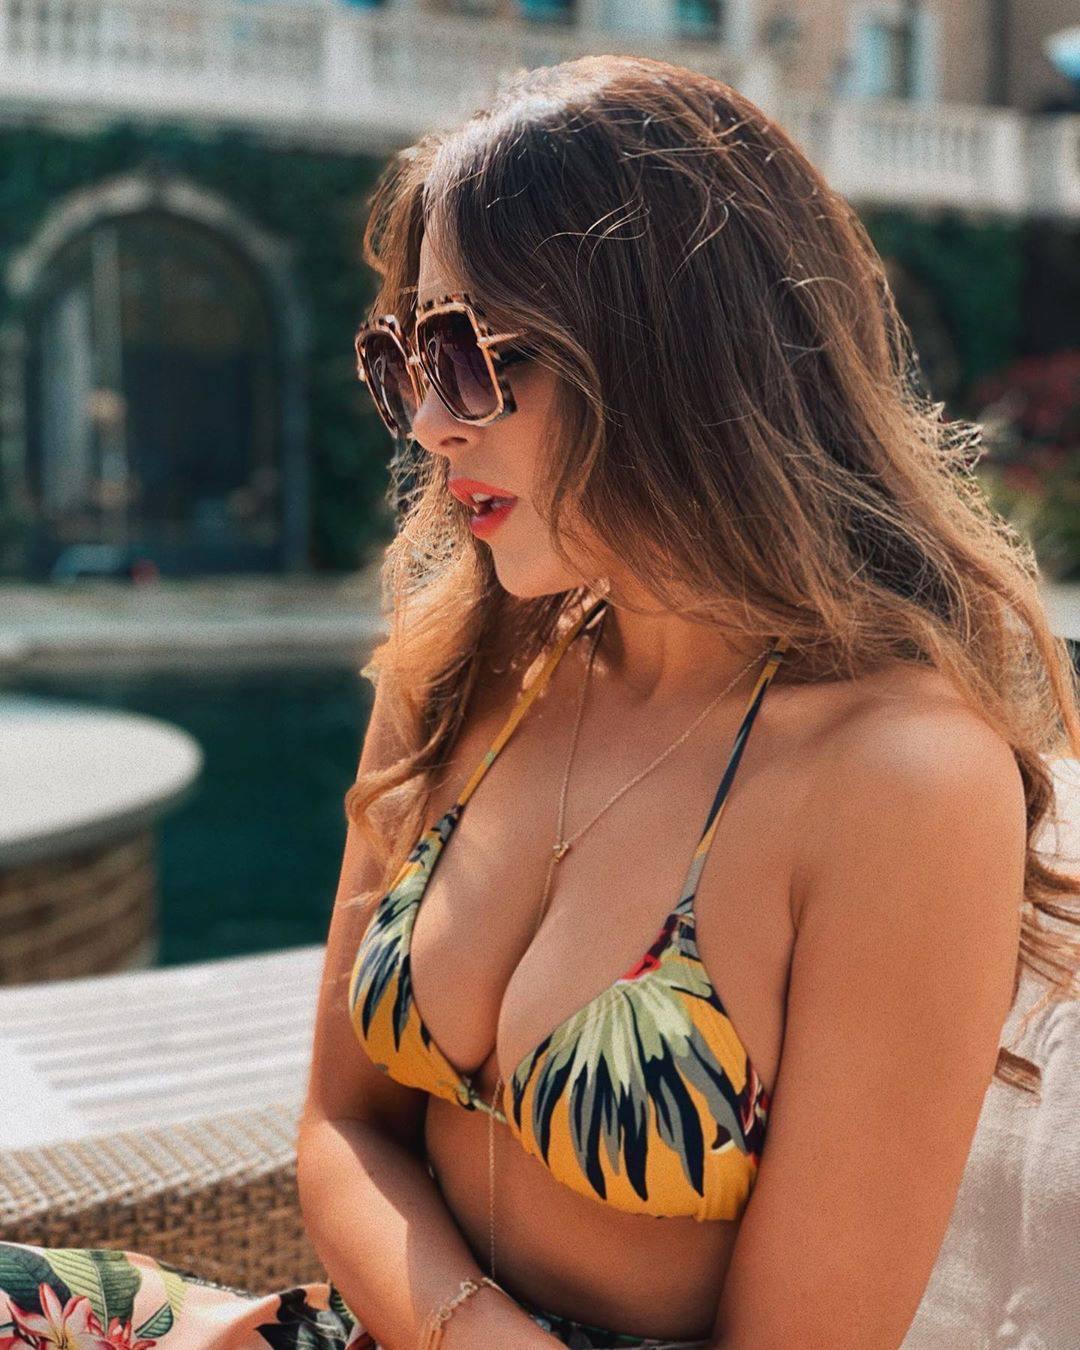 Elizabeth Gilles Sexy Big Breasts In Bikini